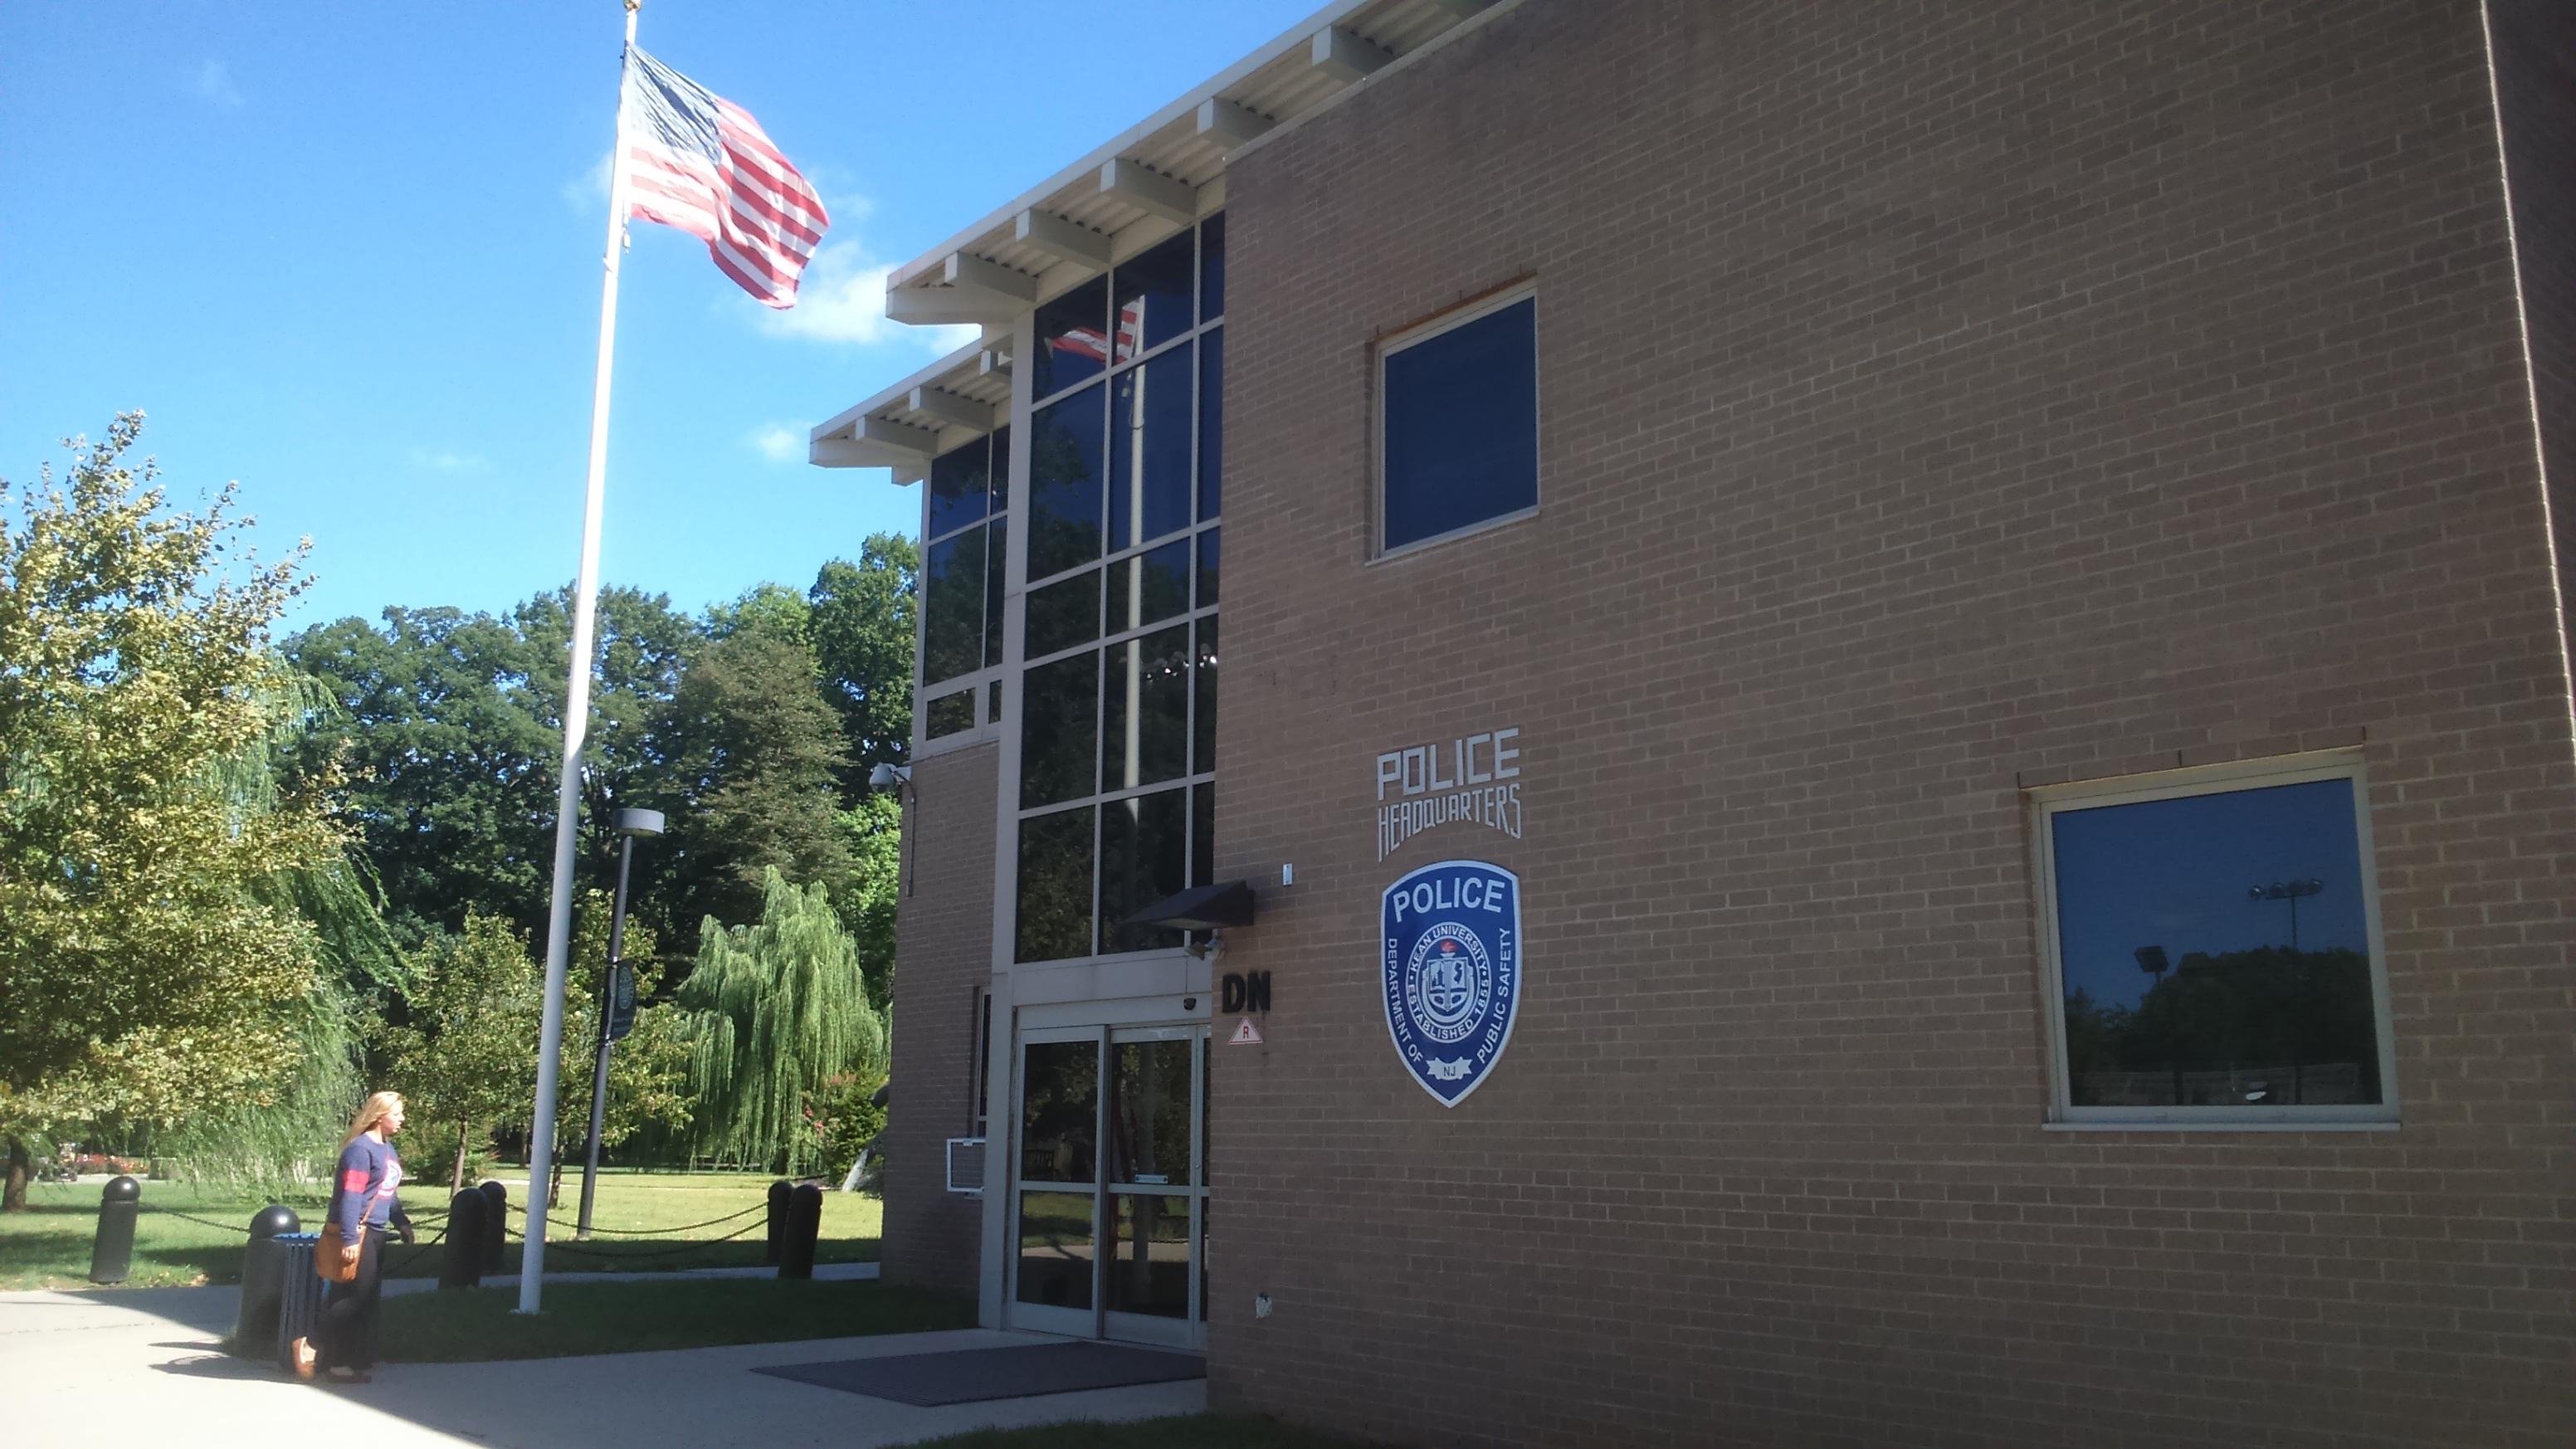 niureit skokie police departments - HD3104×1746